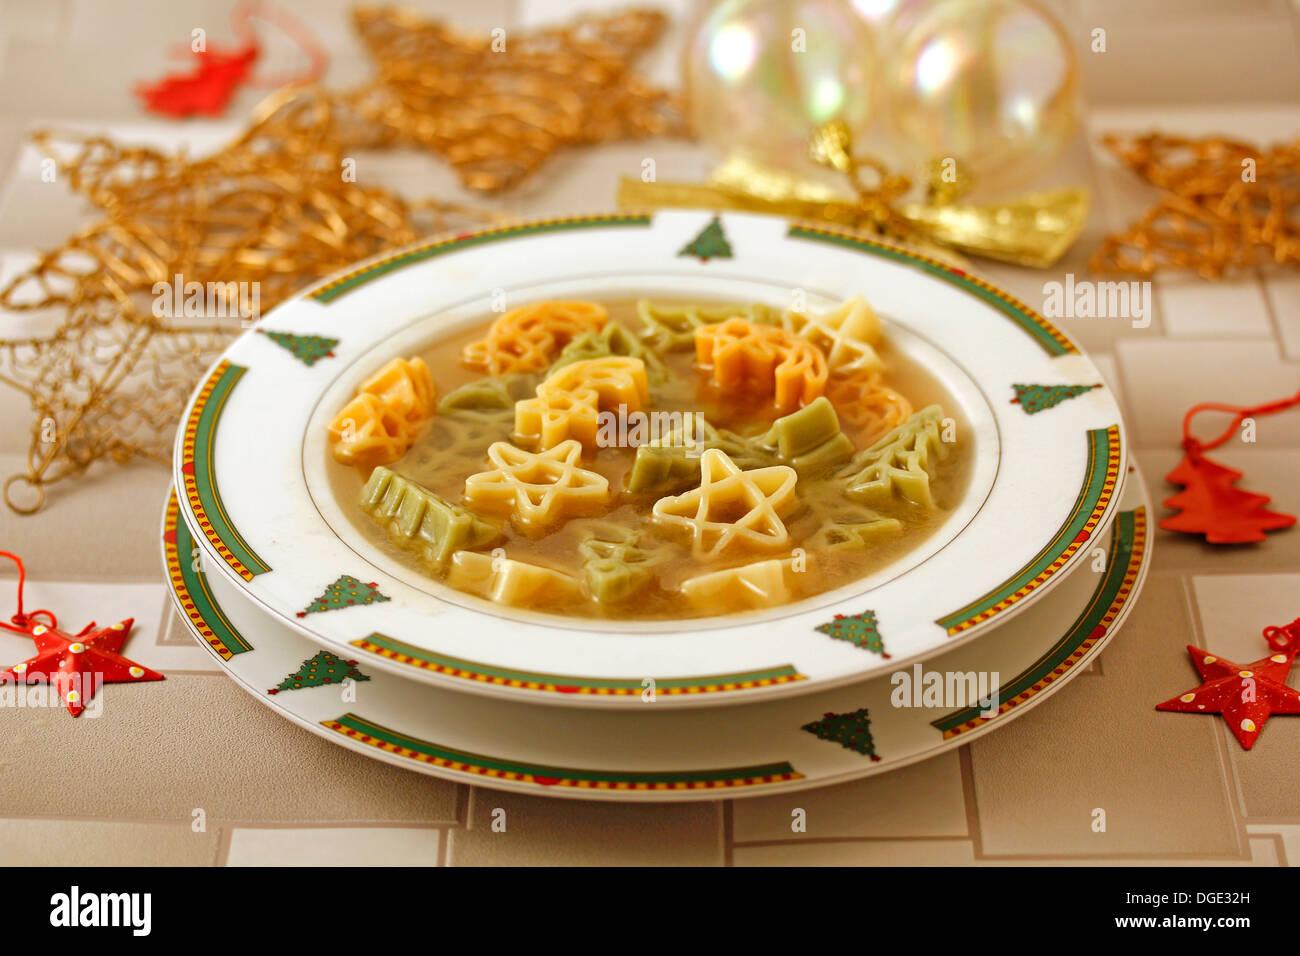 Christmas Soup.Christmas Soup Recipe Available Stock Photo 61775353 Alamy